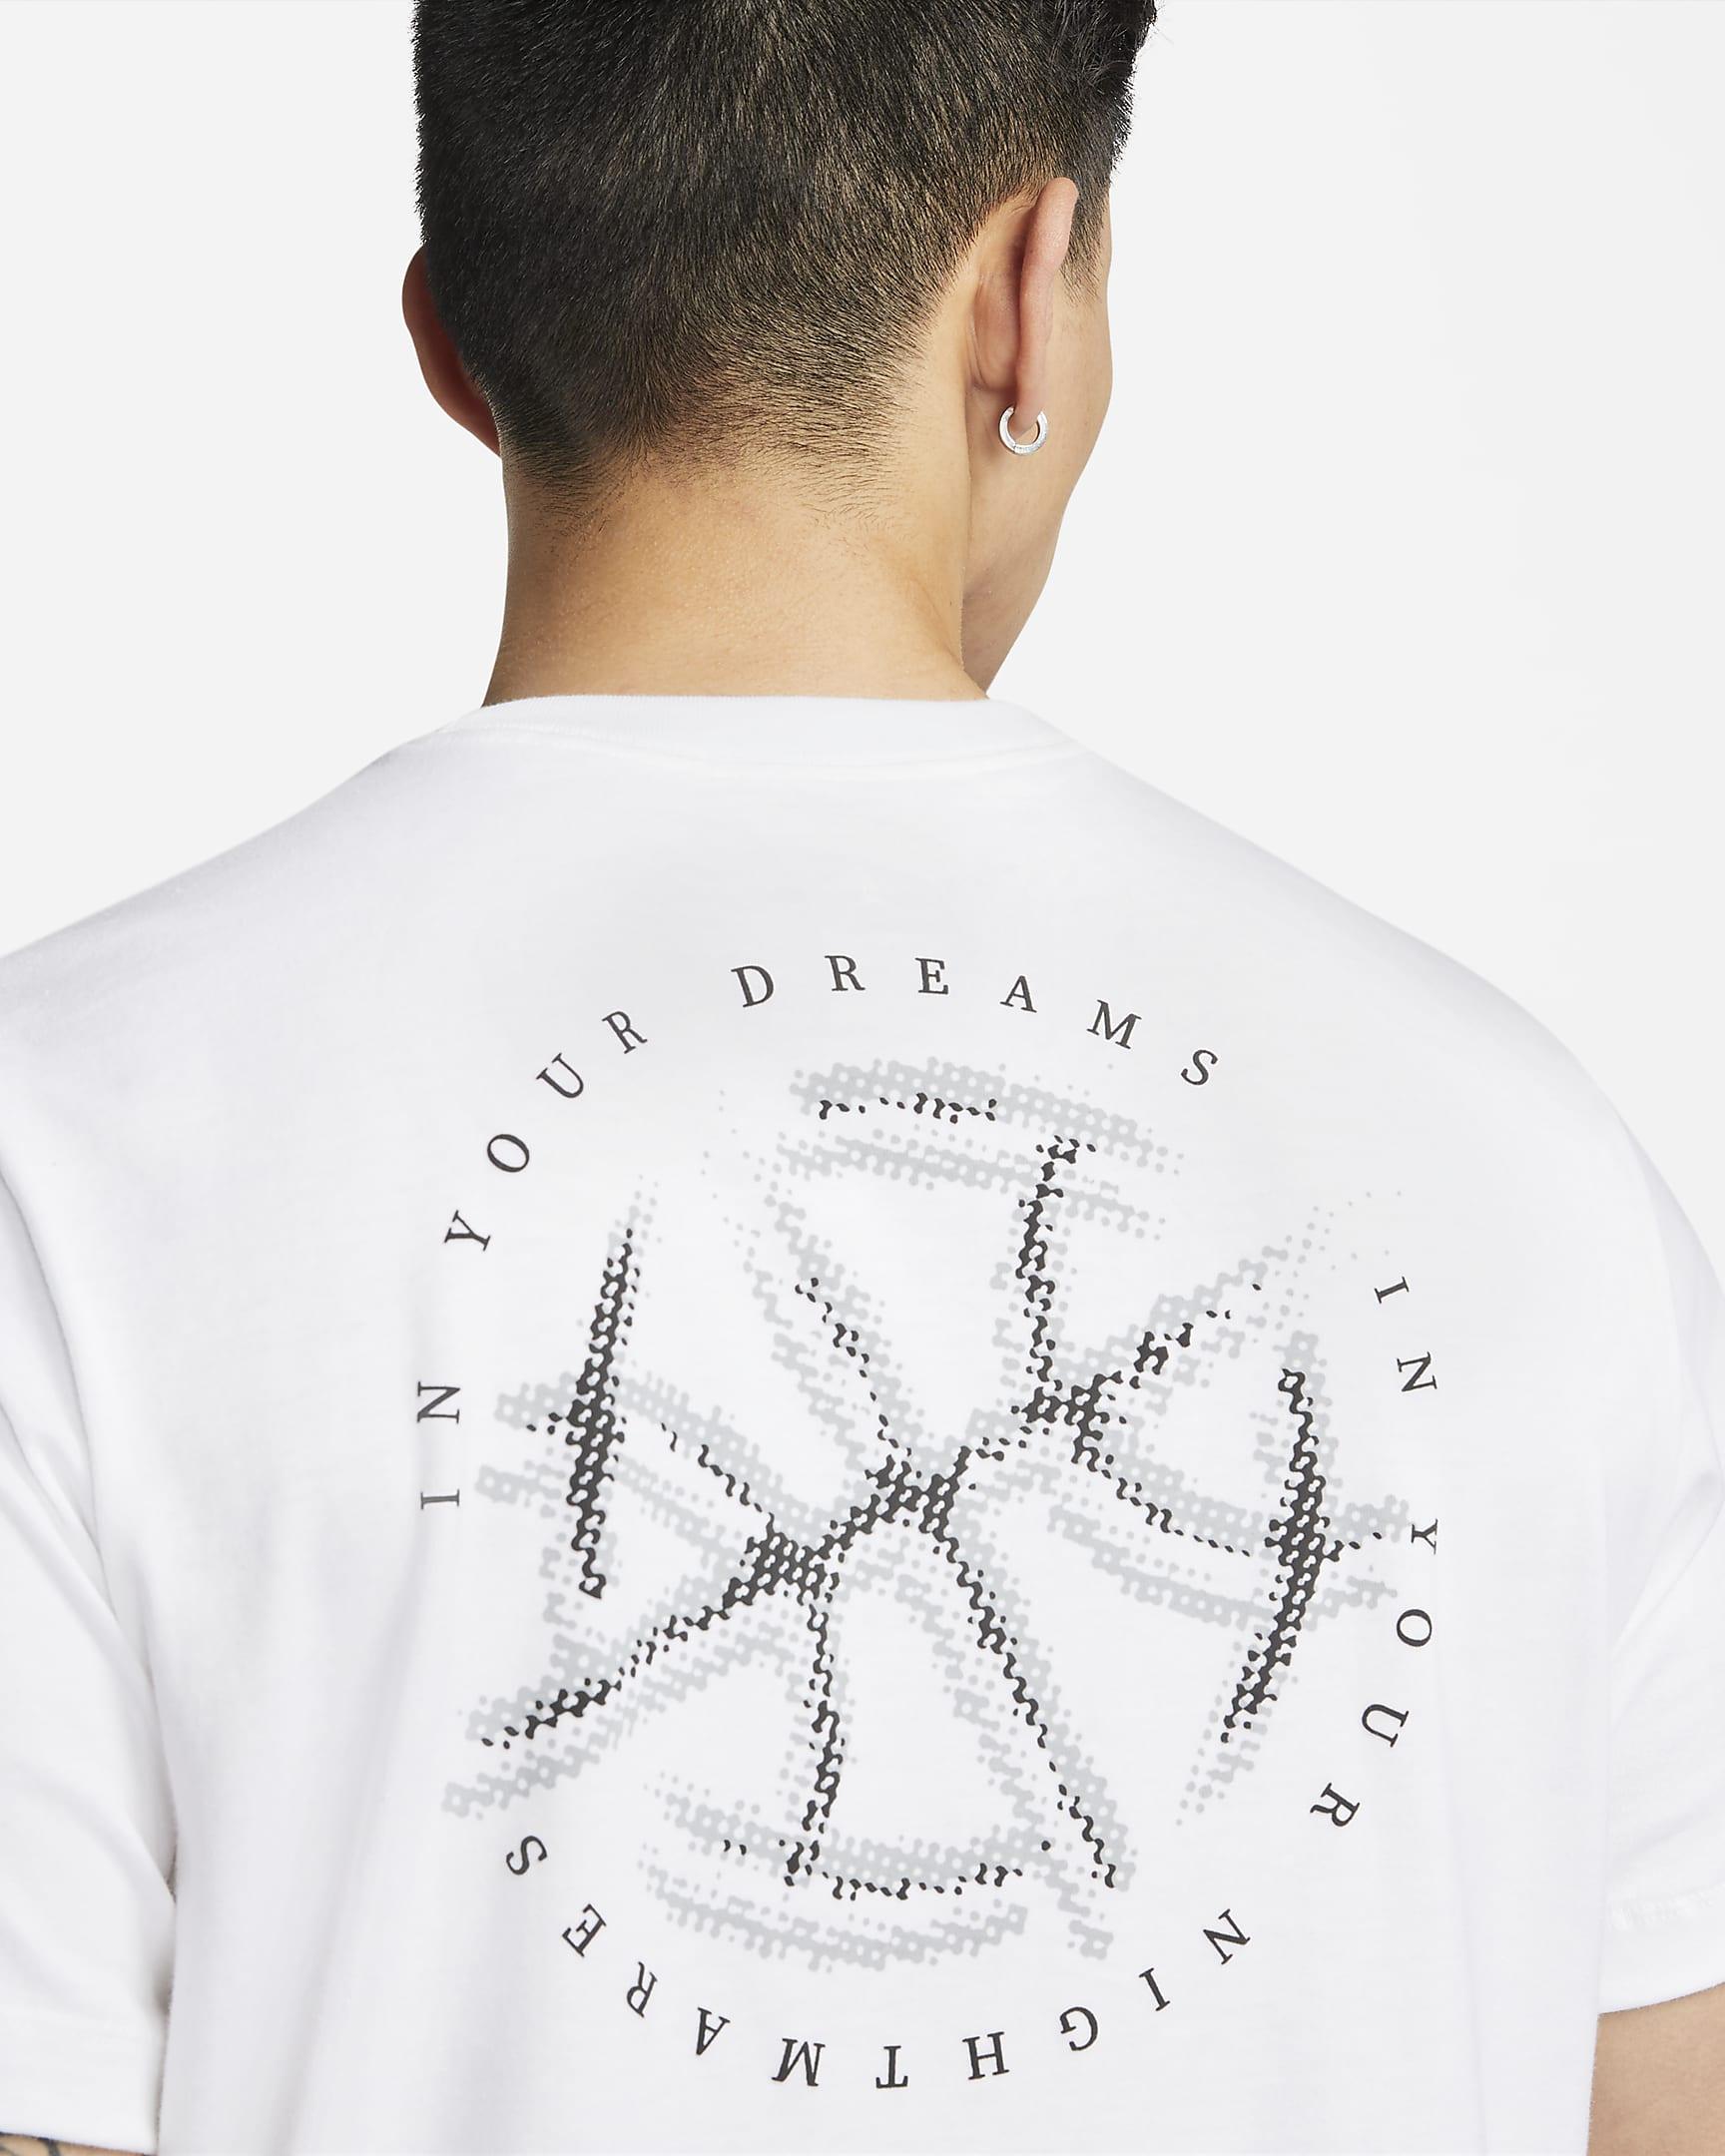 jordan-sport-dna-mens-short-sleeve-t-shirt-5dQJlz-3.png